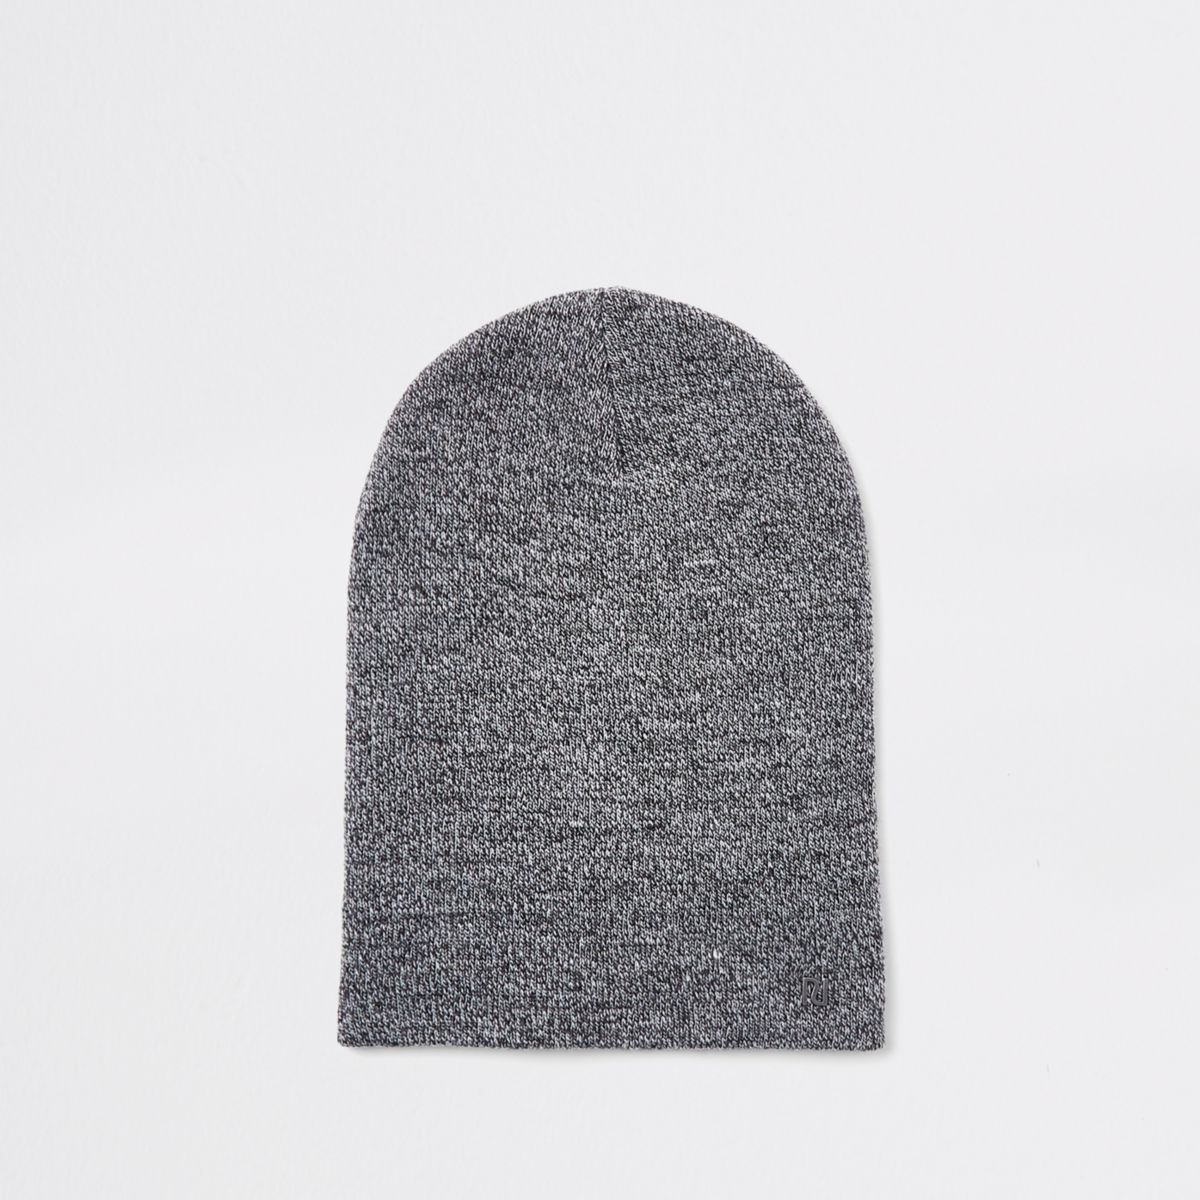 Light grey twist slouch beanie hat